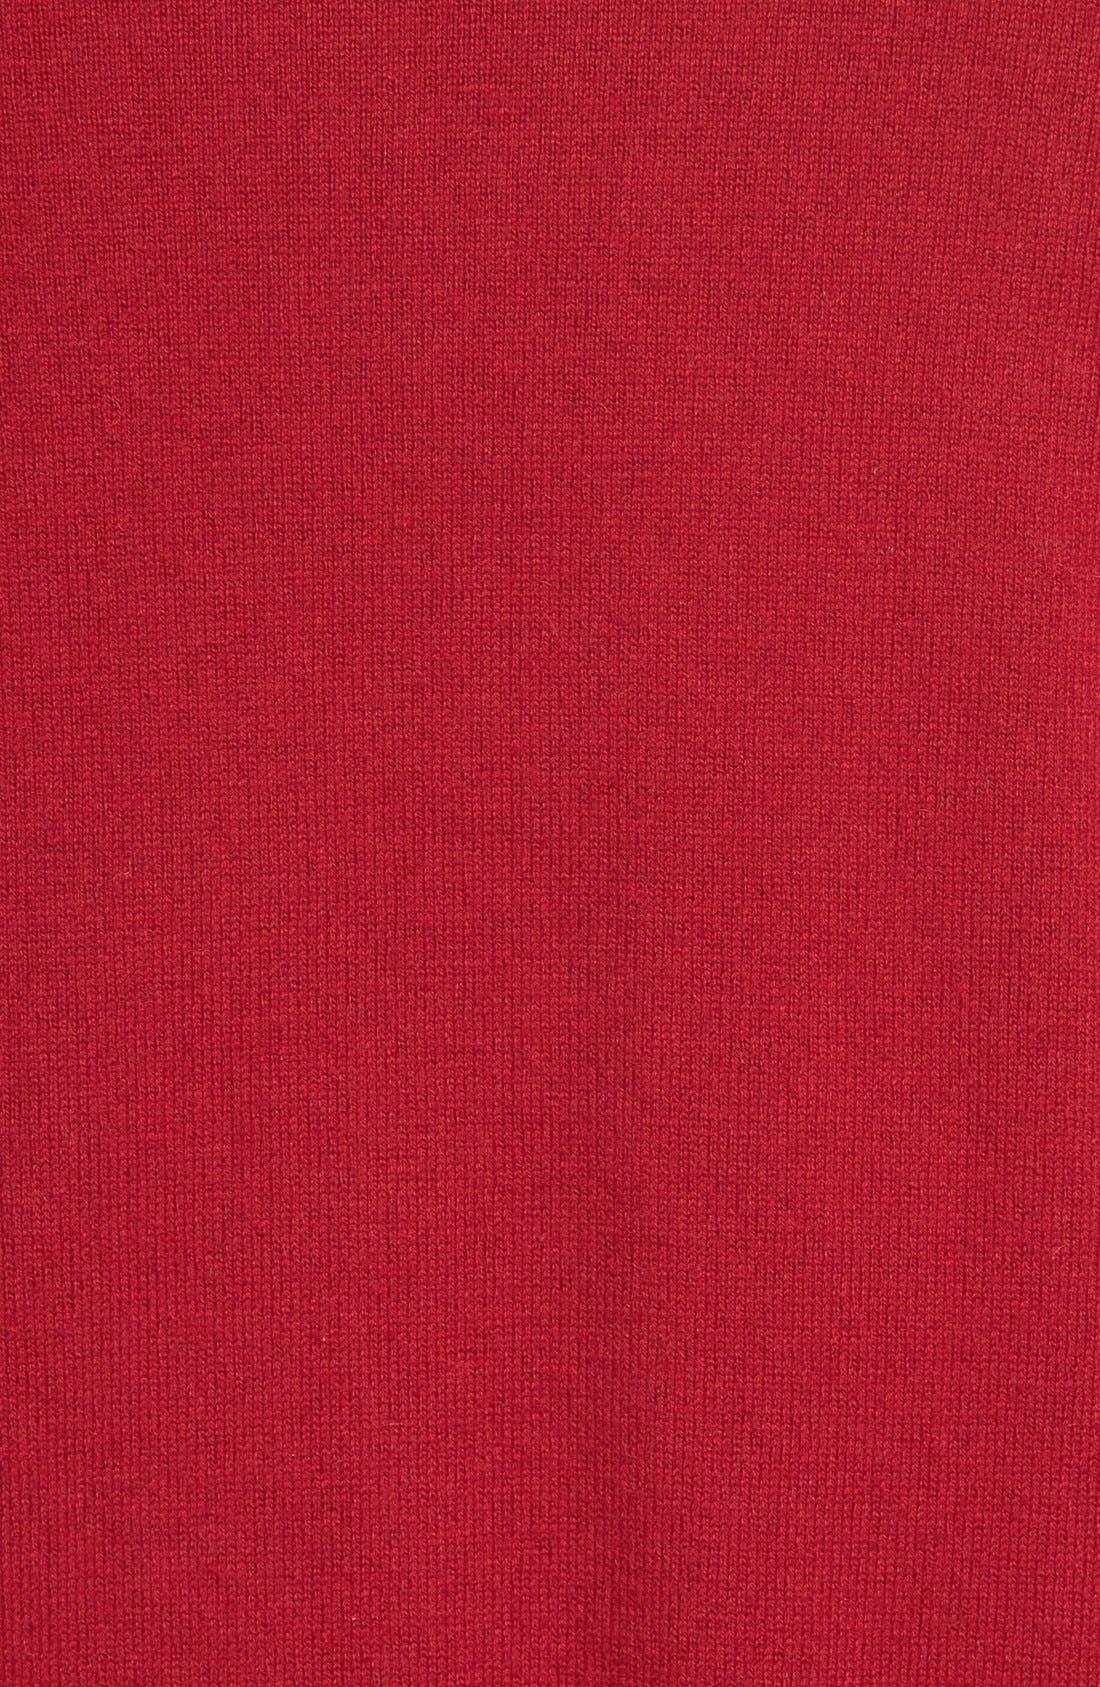 'Jersey Sport' Cotton Blend Crewneck Sweater,                             Alternate thumbnail 40, color,